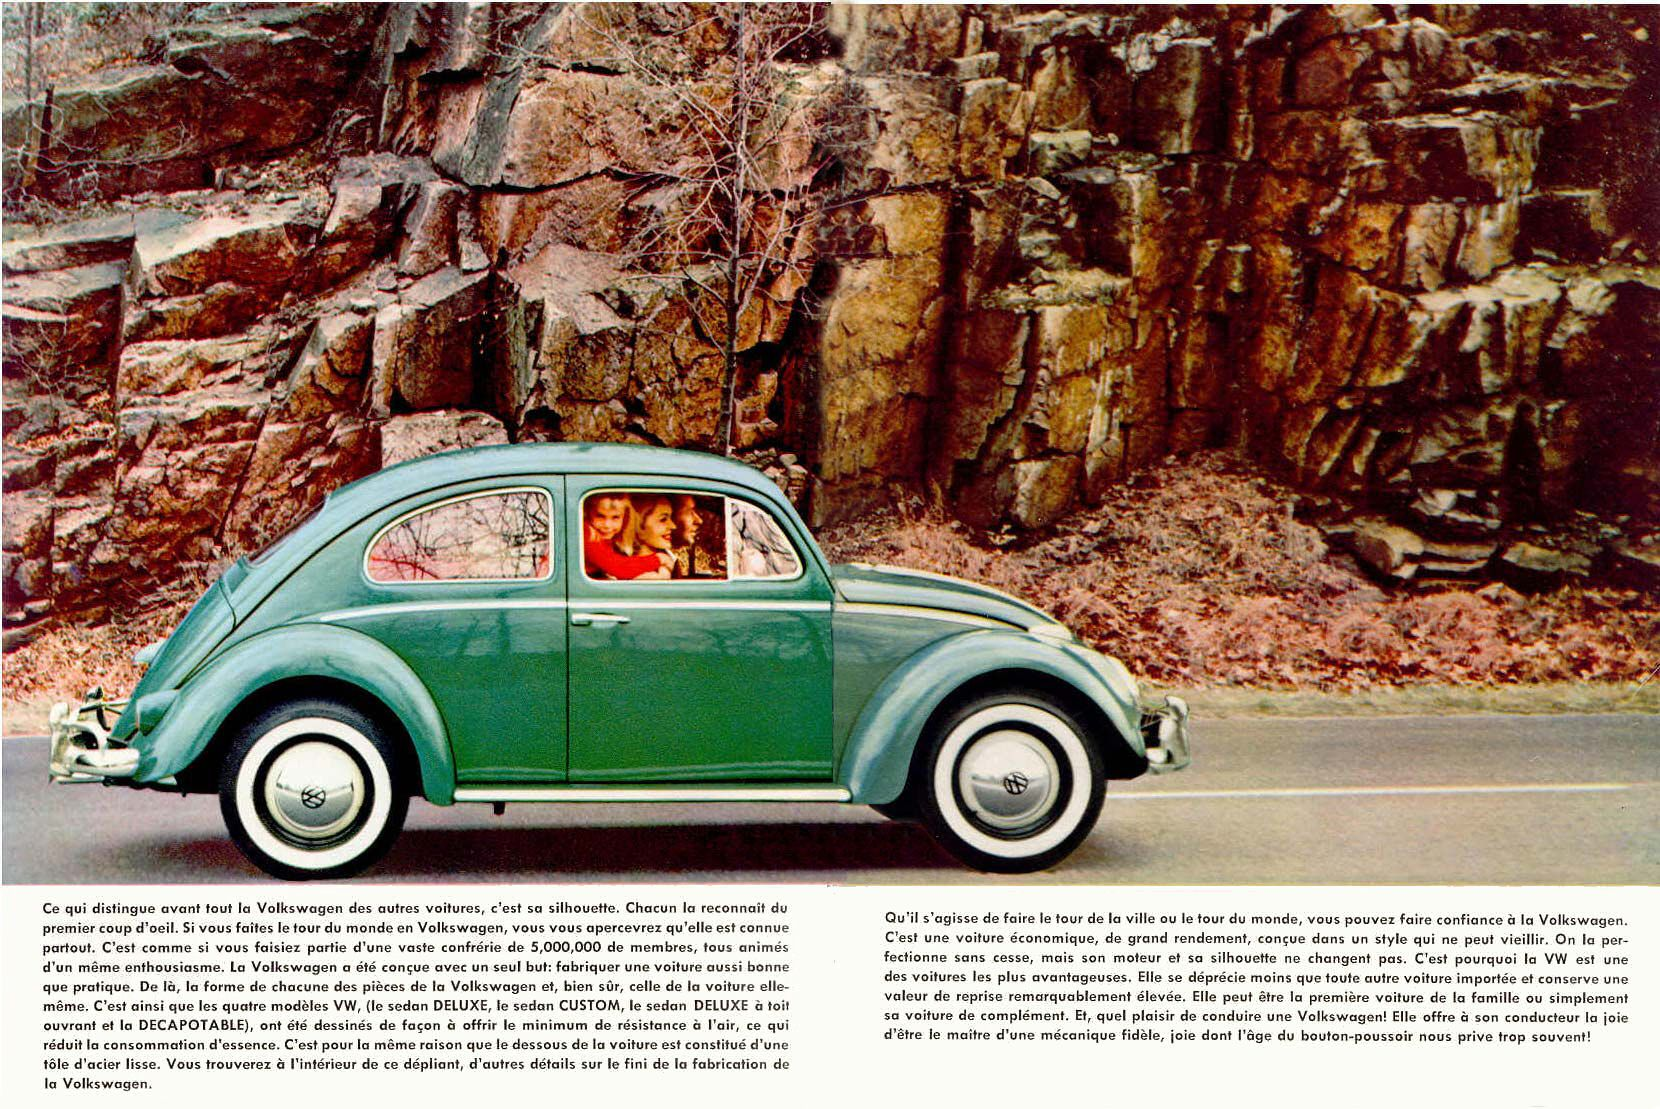 VW Beetle Canada brochure page 2 Vw classic, Volkswagen